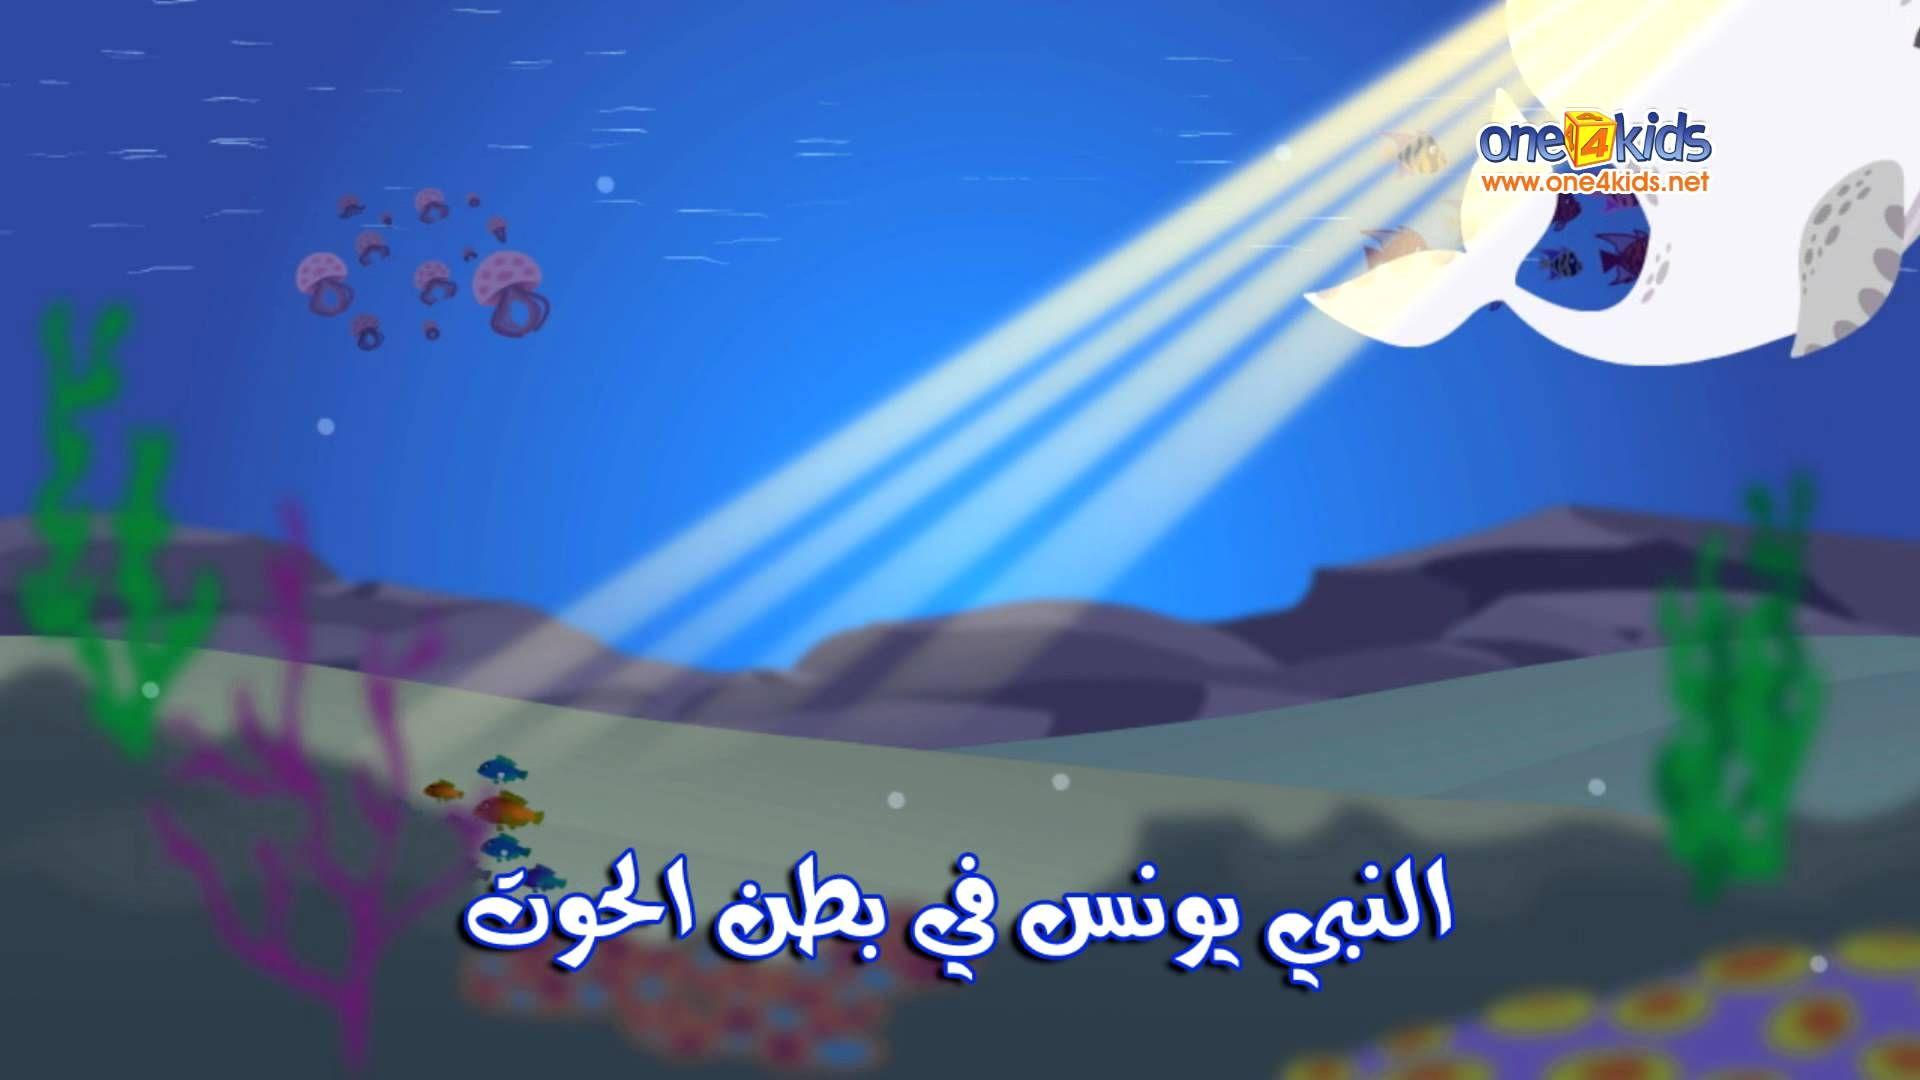 Nasheed Prophet Yunus With Arabic Text Arabic Text Animation Film Prophet